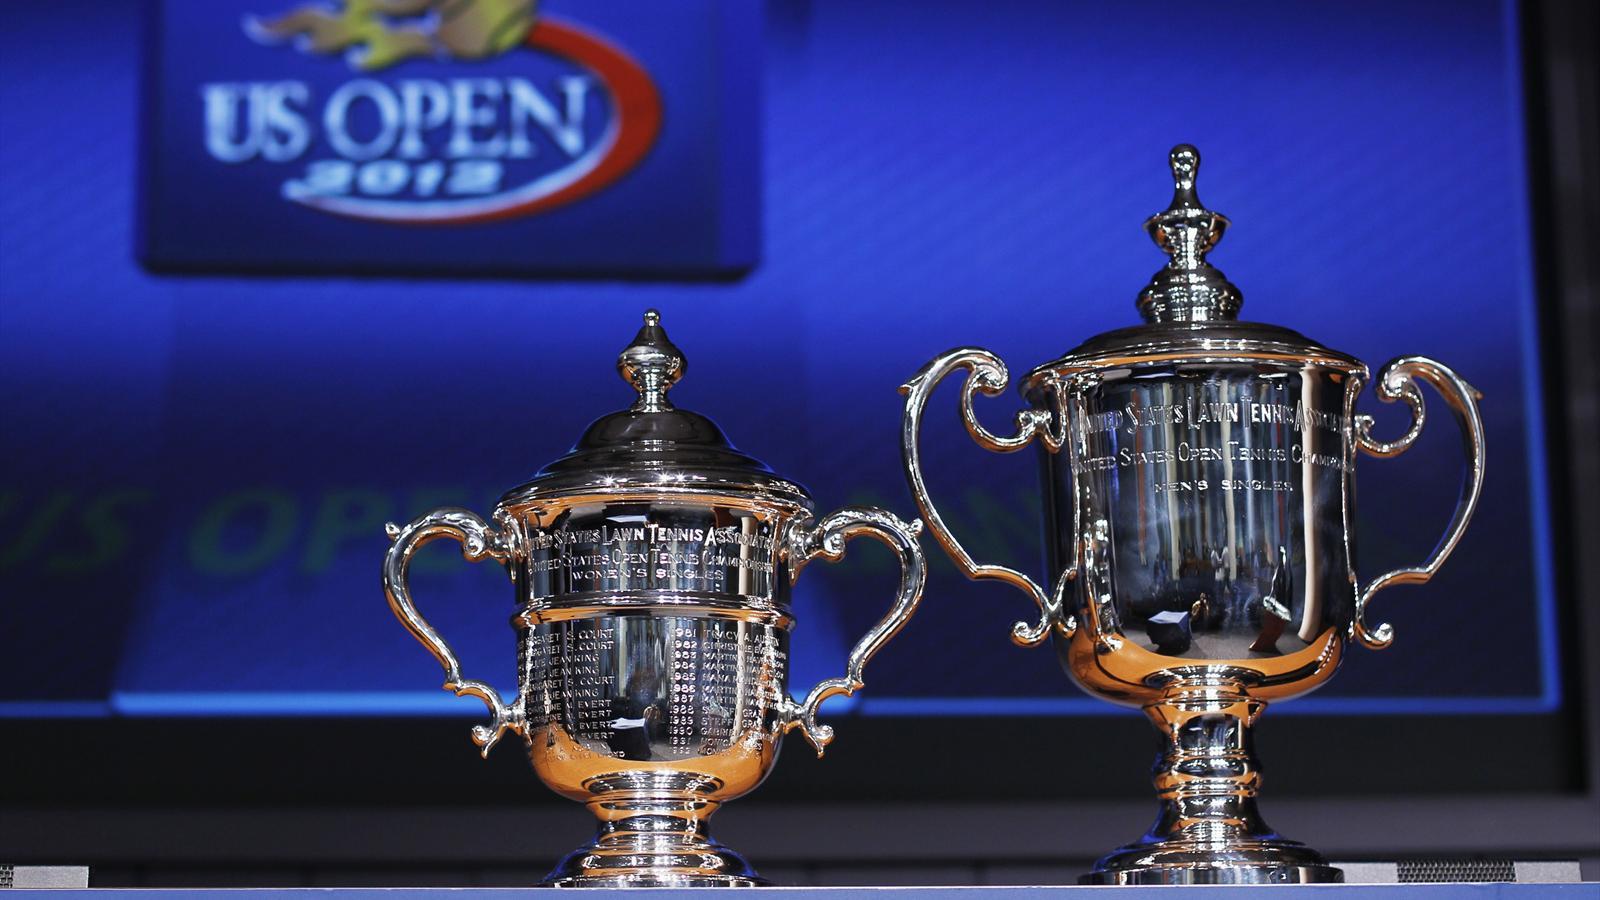 US Open: Day 14 - US Open 2012 - Tennis - Eurosport Australia